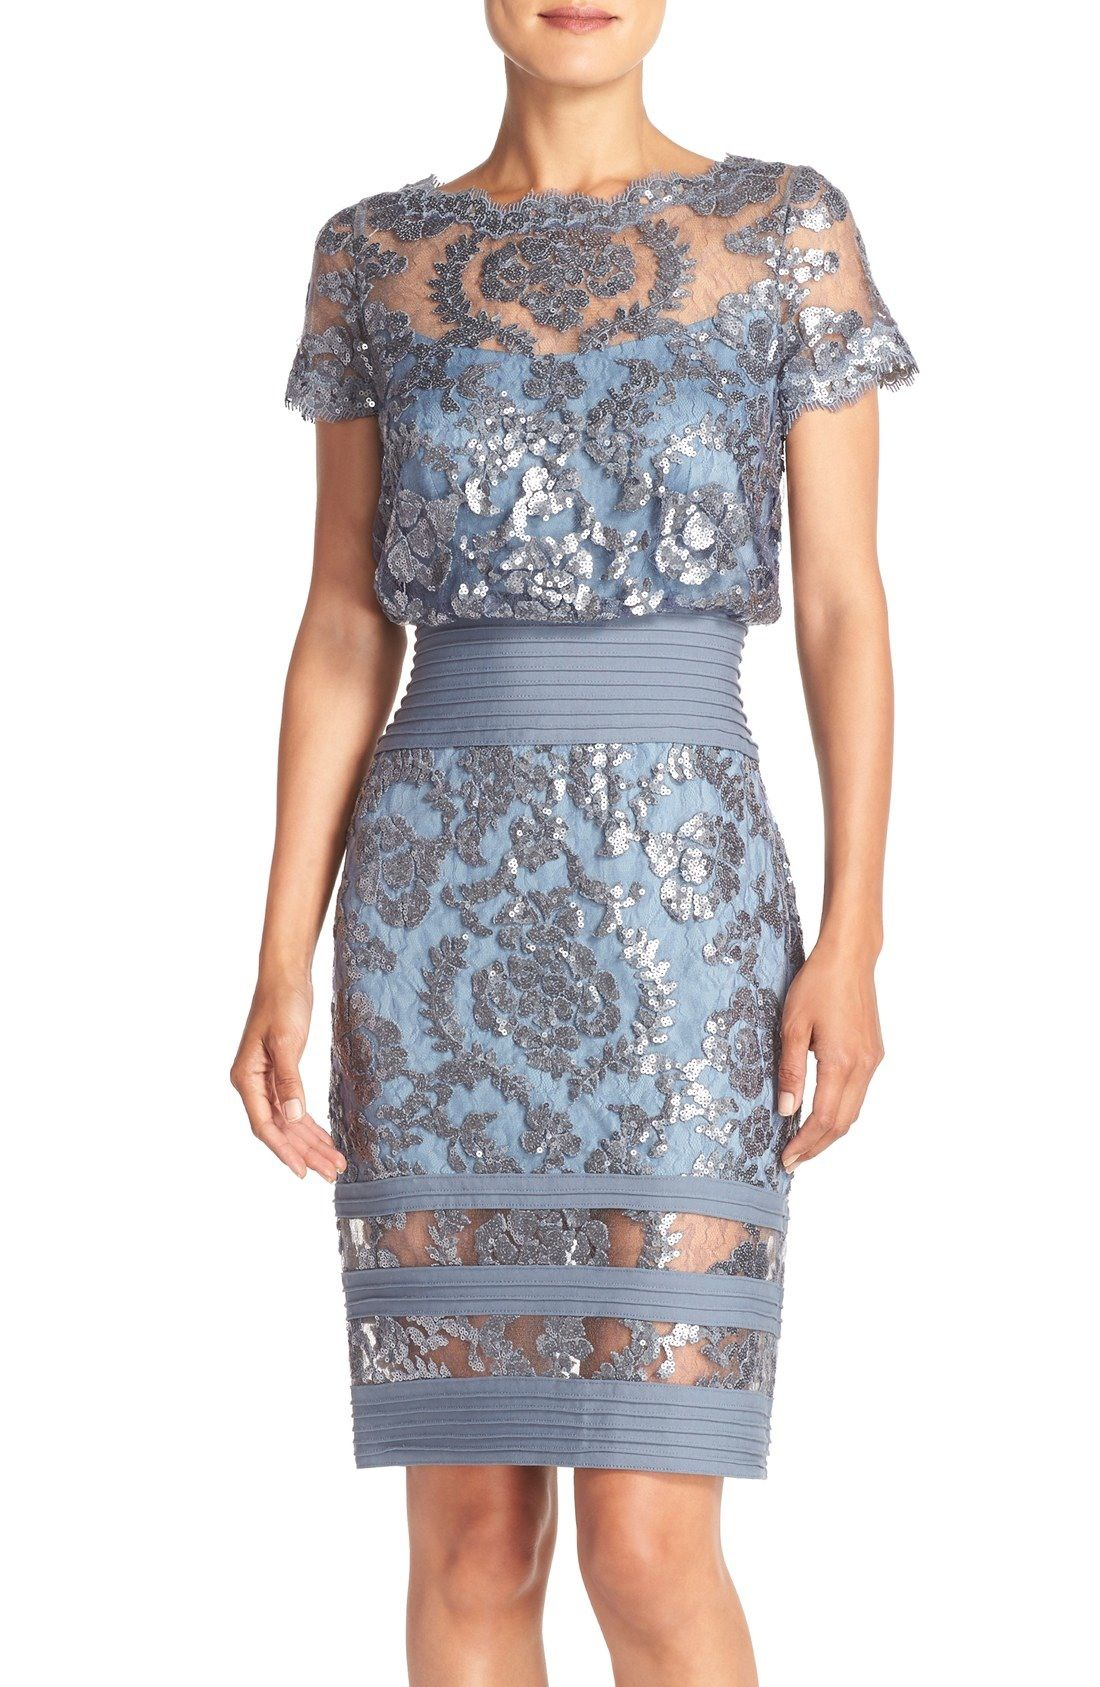 Tadashi Shoji Sequin Embroidered Blouson Dress Regular